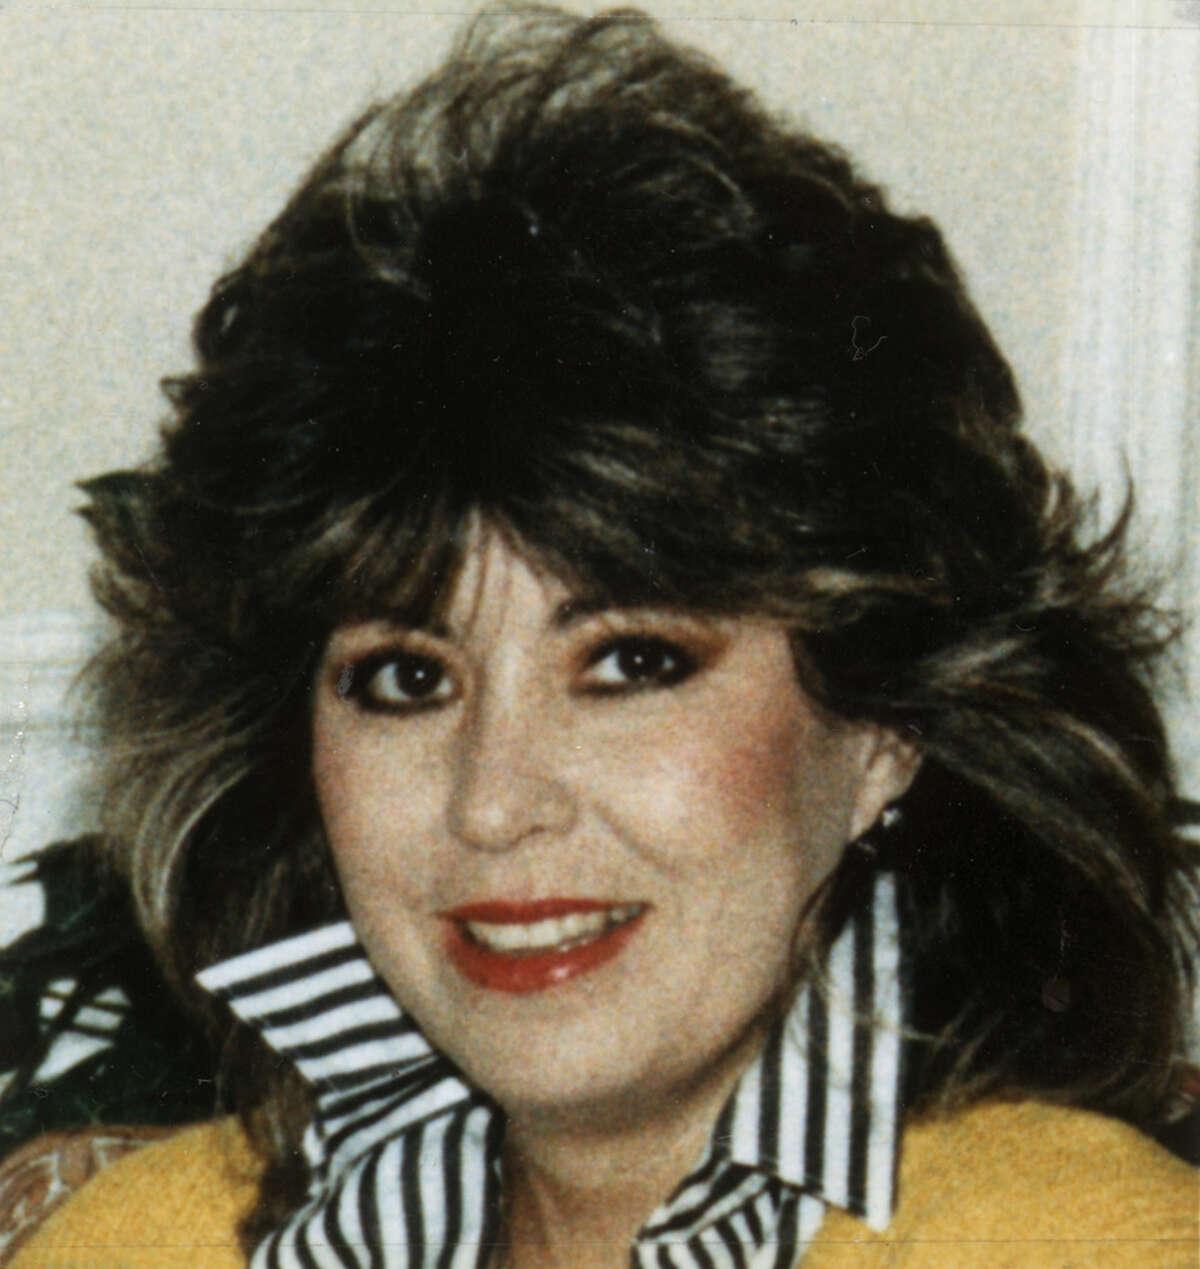 CONTACT FILED: MARILU SERRATO GERI. copy shot of Marilu Serrato Geri, 33, Sugar Land murder victim, killed in her home, Valentine's Day Feb. 14, 1986.